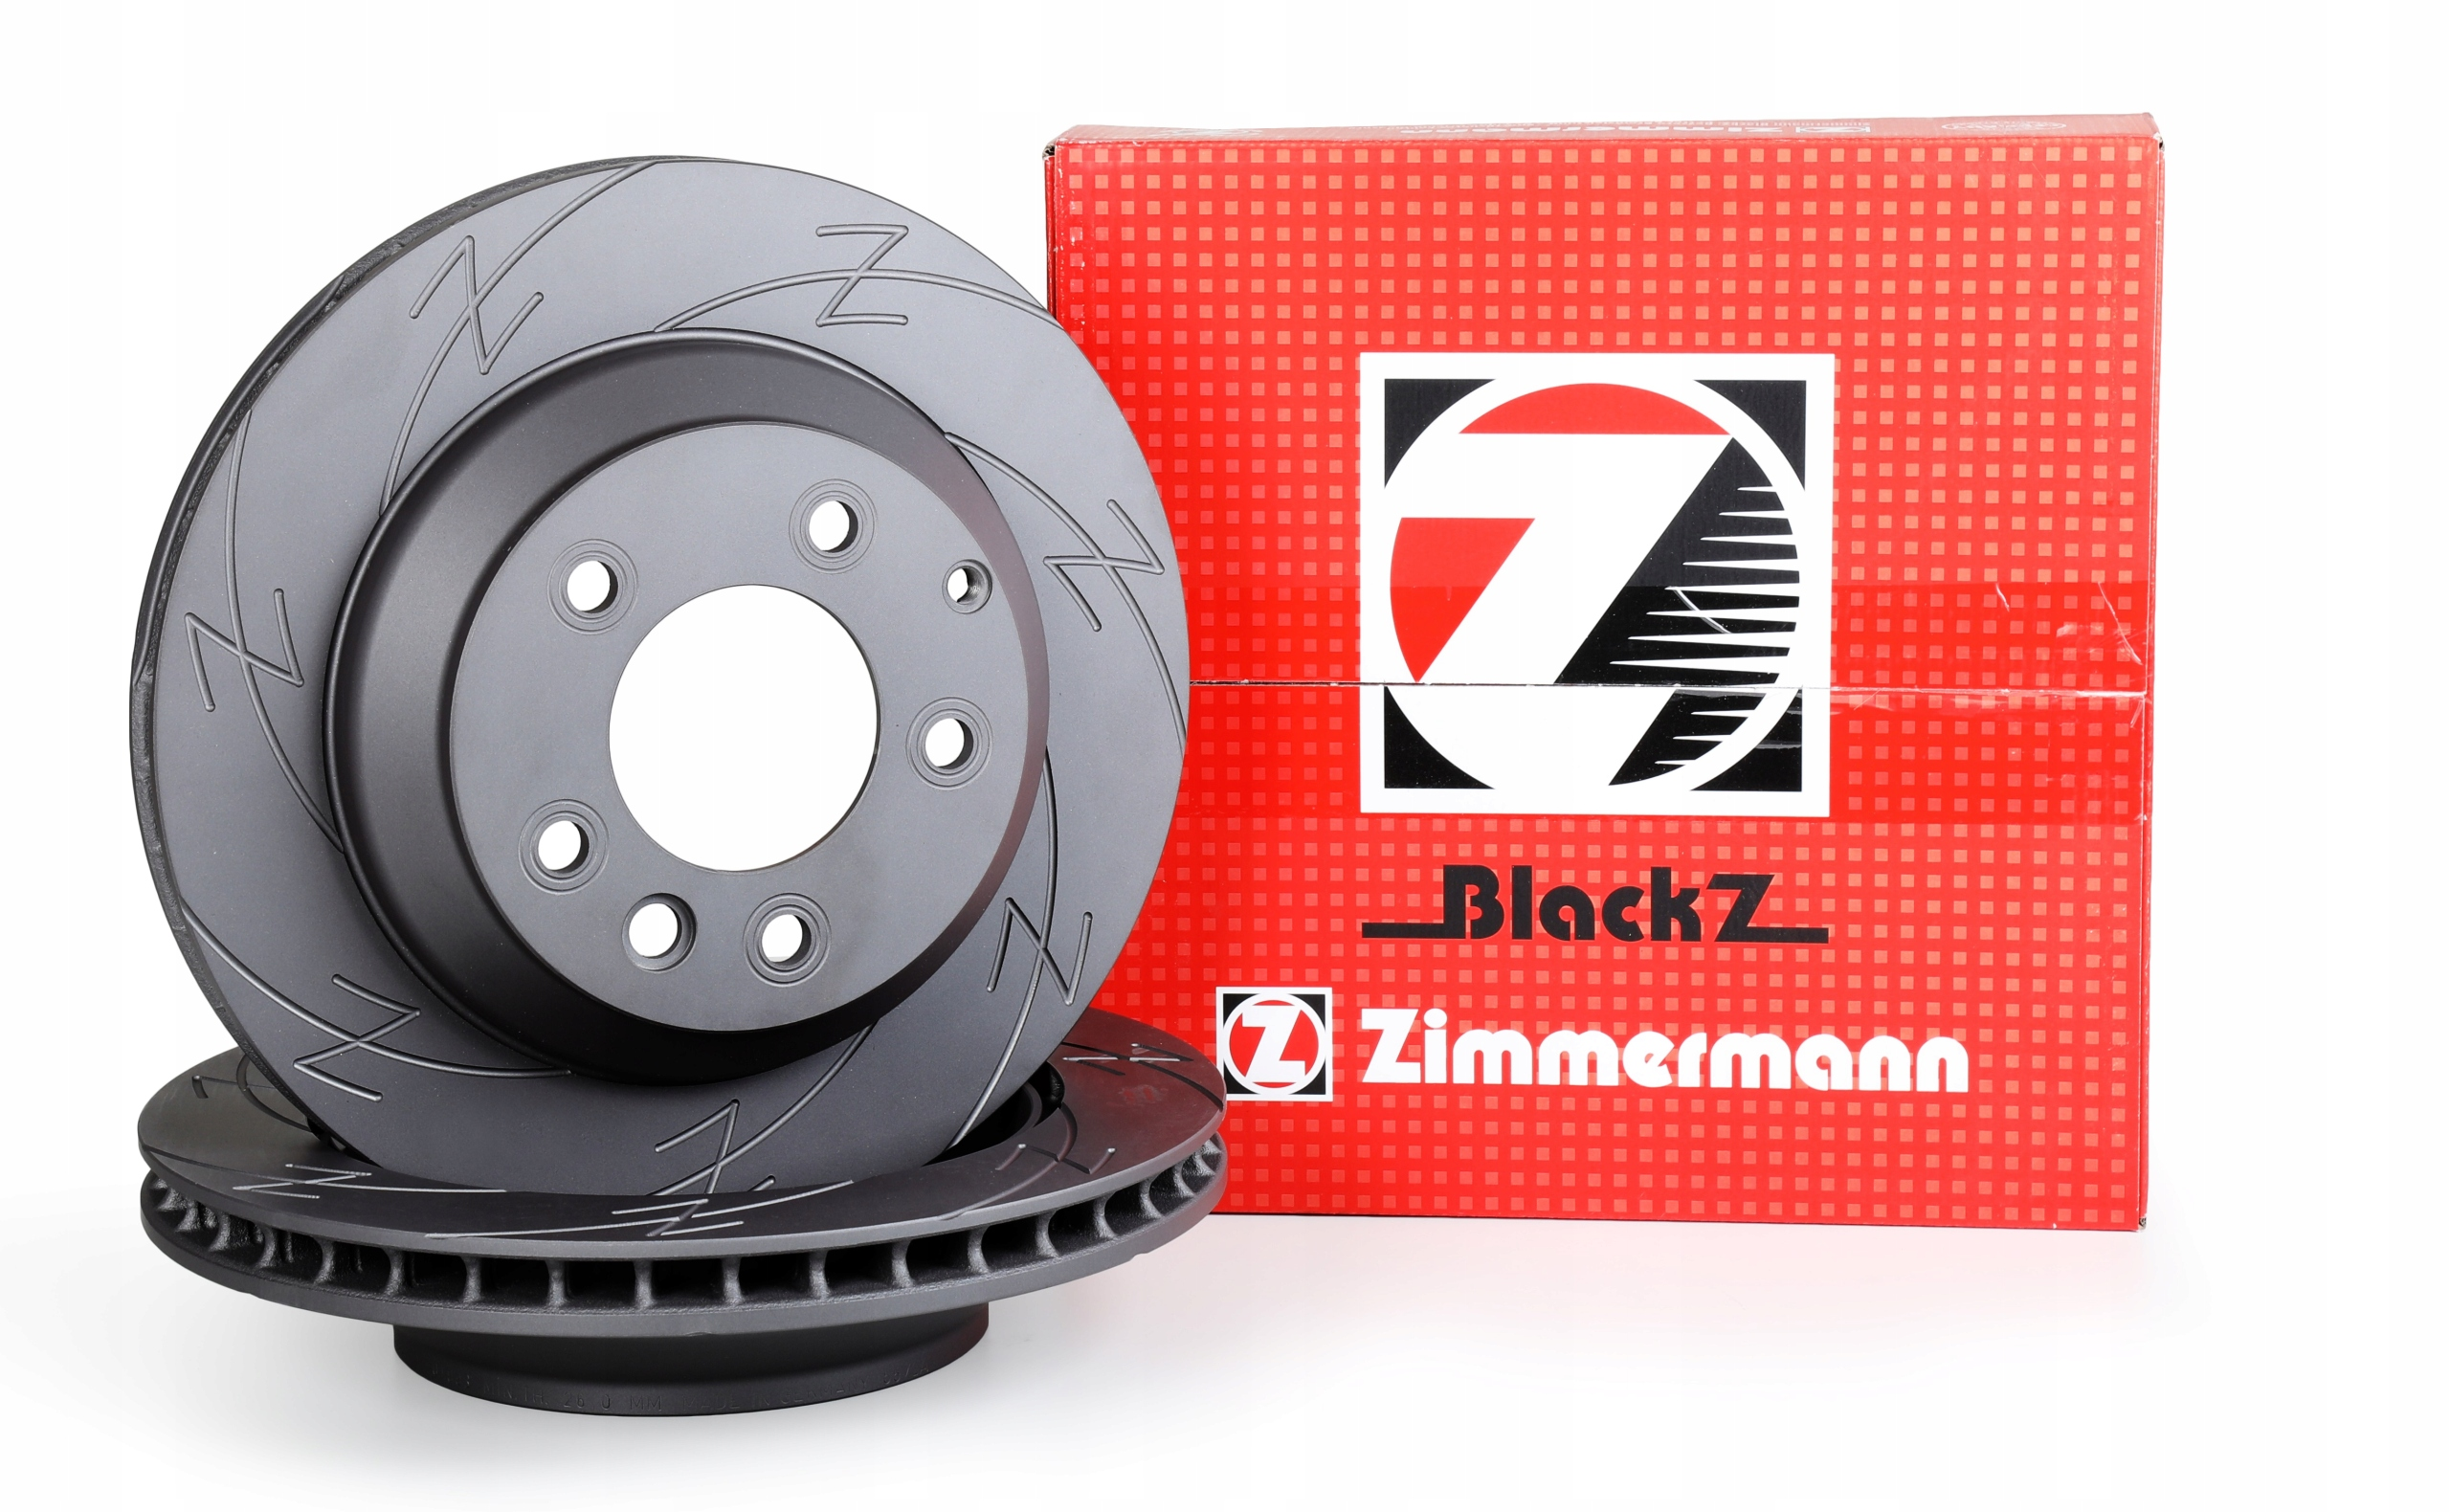 Tarcze ZIMMERMANN BLACK Z Przód - BMW 5 E60 324mm